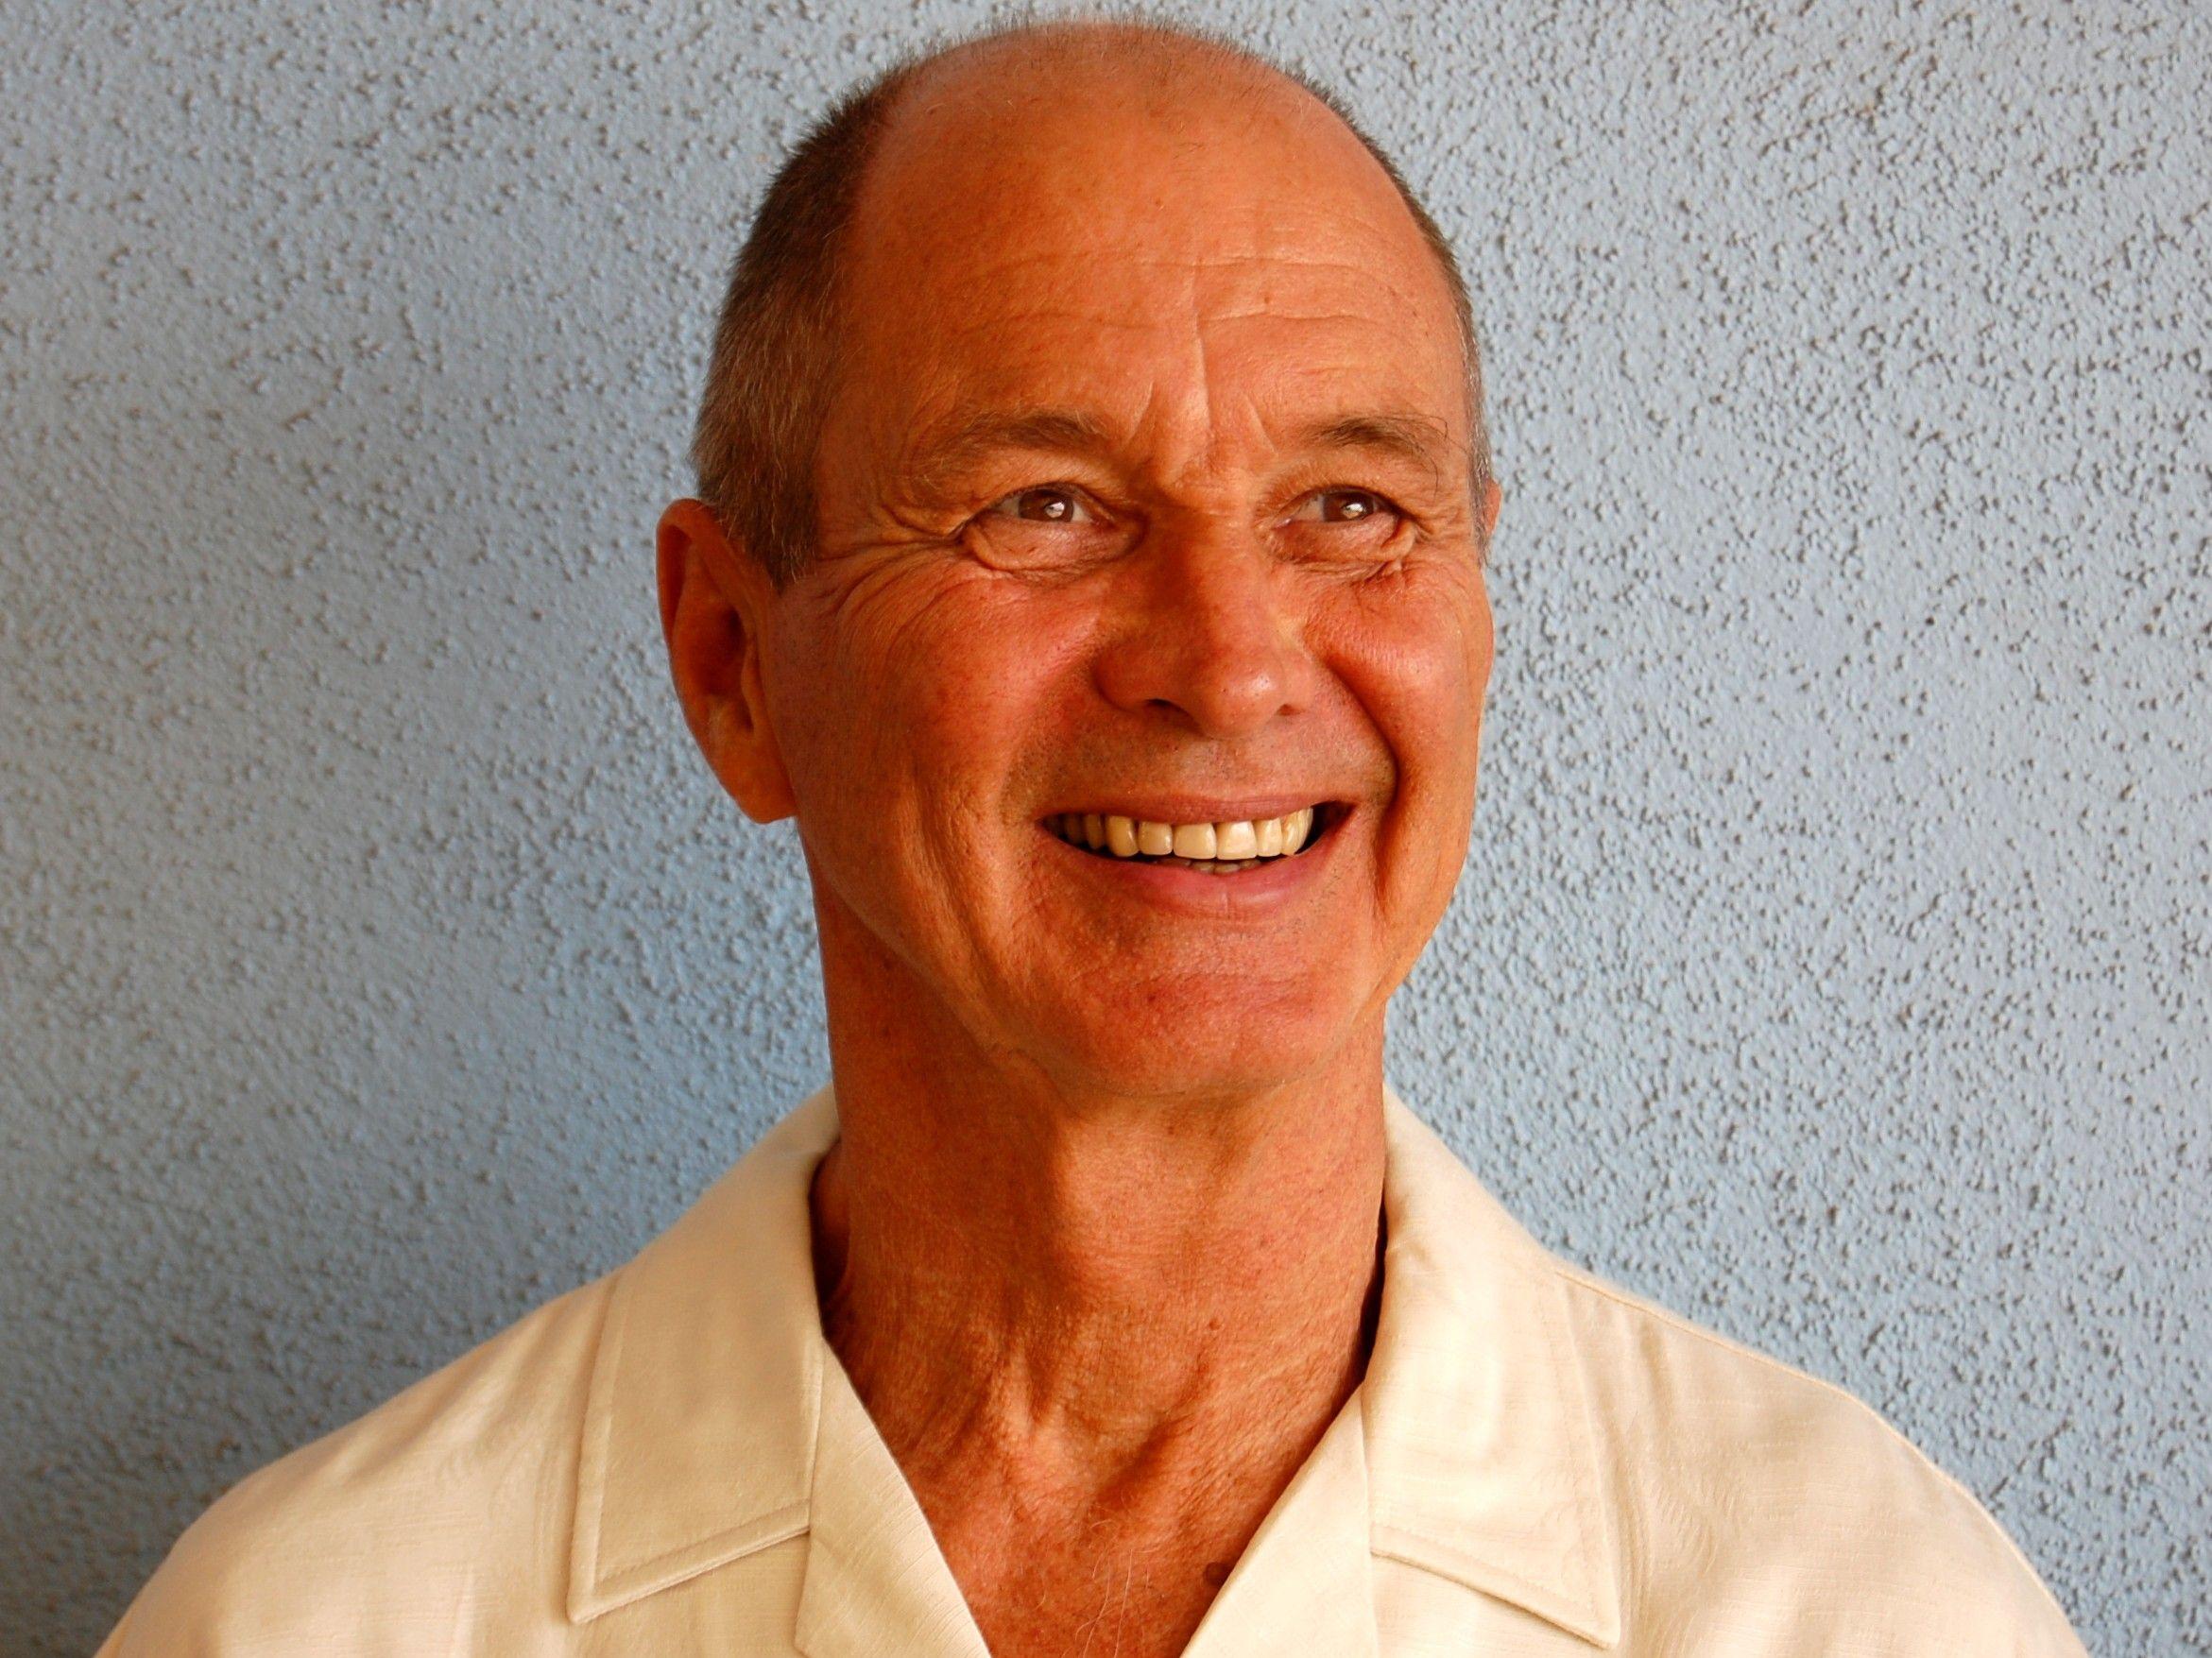 David cockrell 6